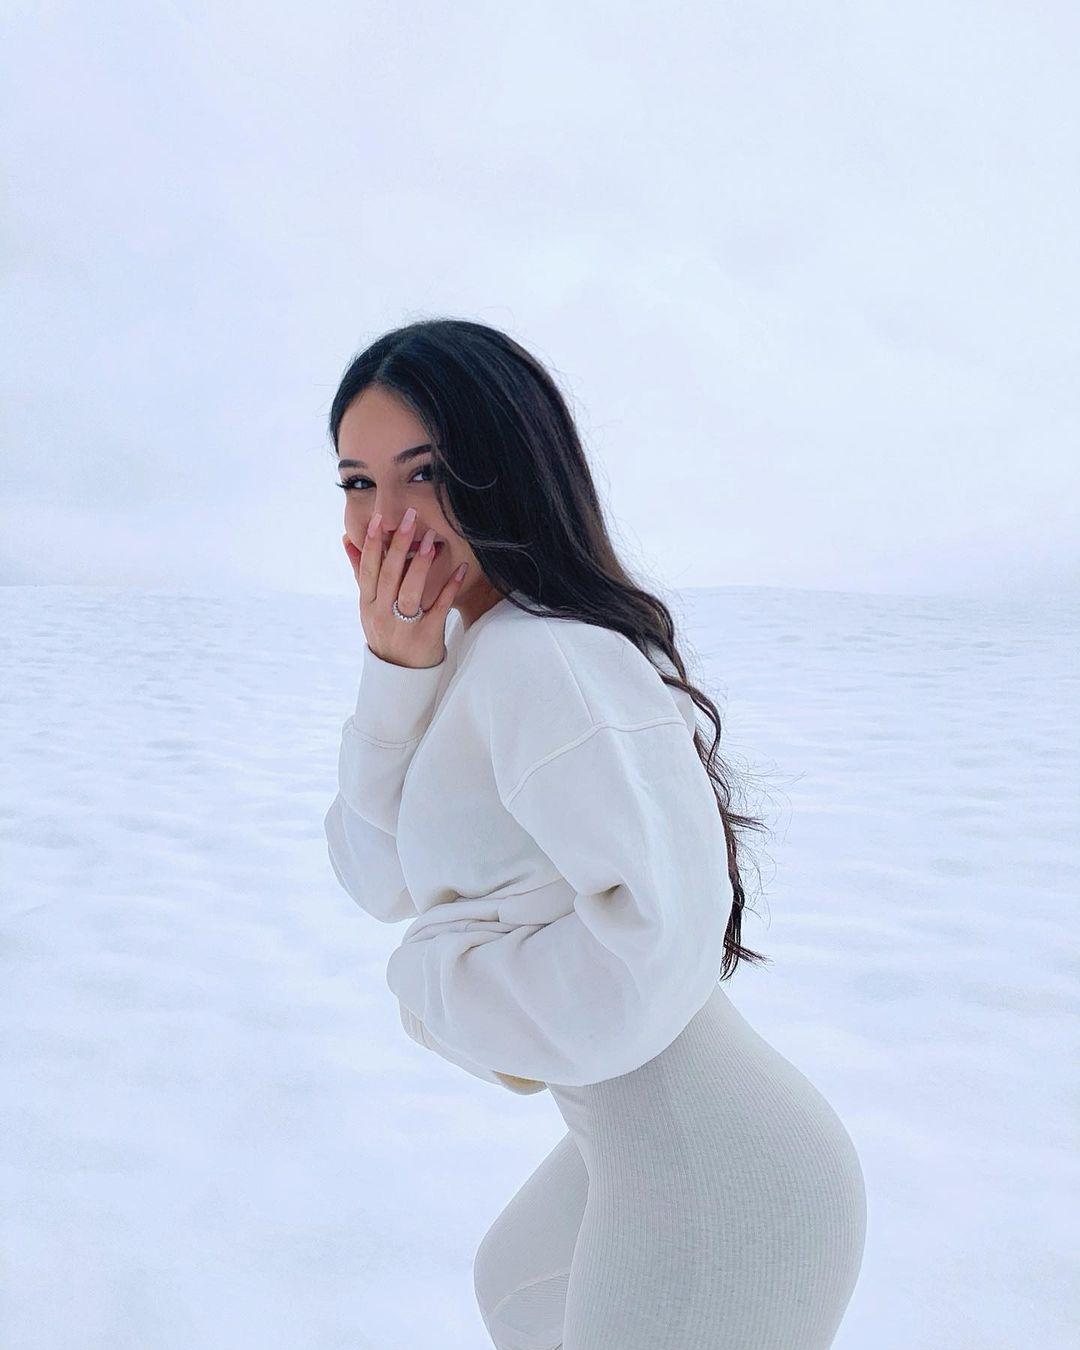 Leyla-Melina-Wallpapers-Insta-Fit-Bio-38